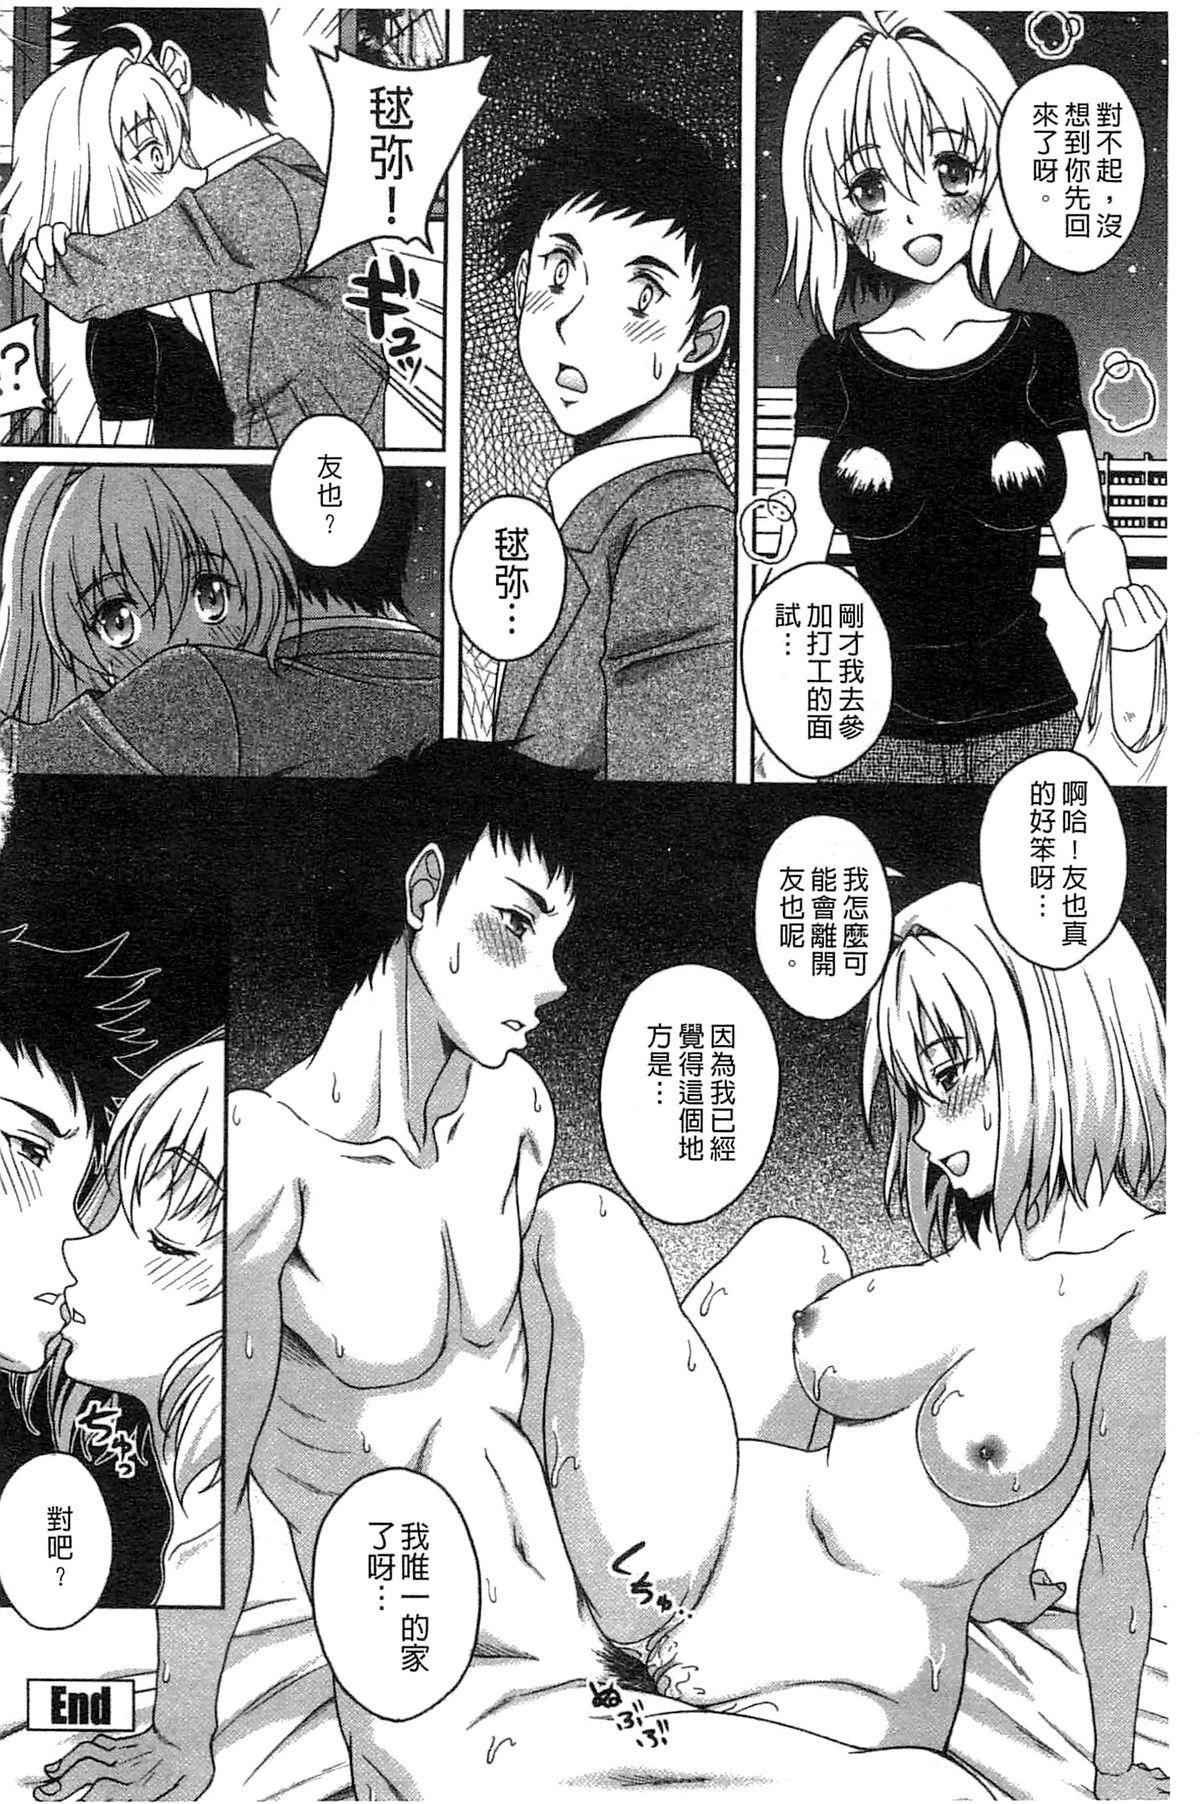 Hajimete nan dakara - First sexual experience 202